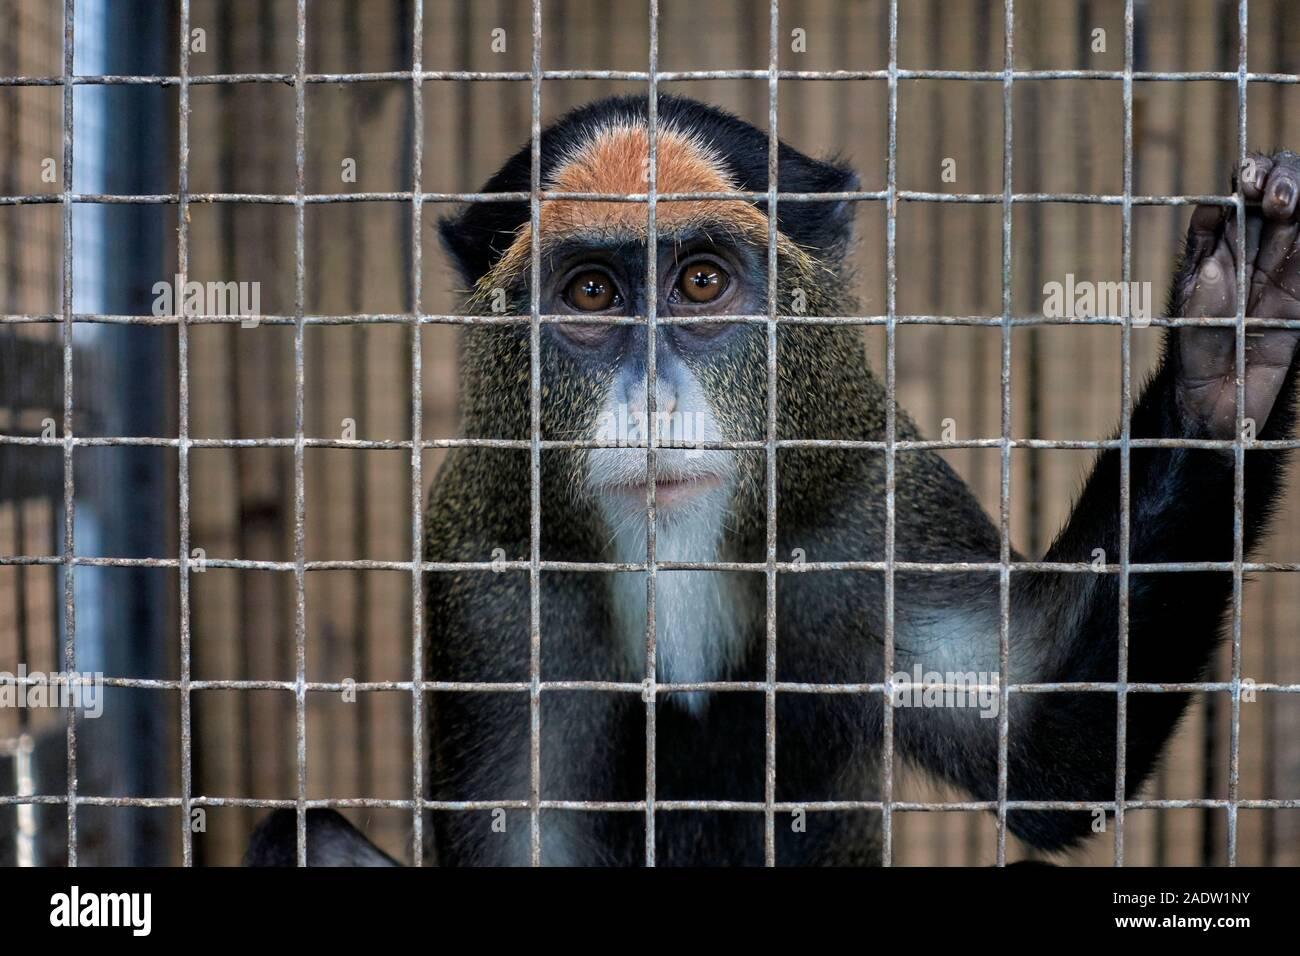 caged-animal-de-brazzas-monkey-2ADW1NY.j